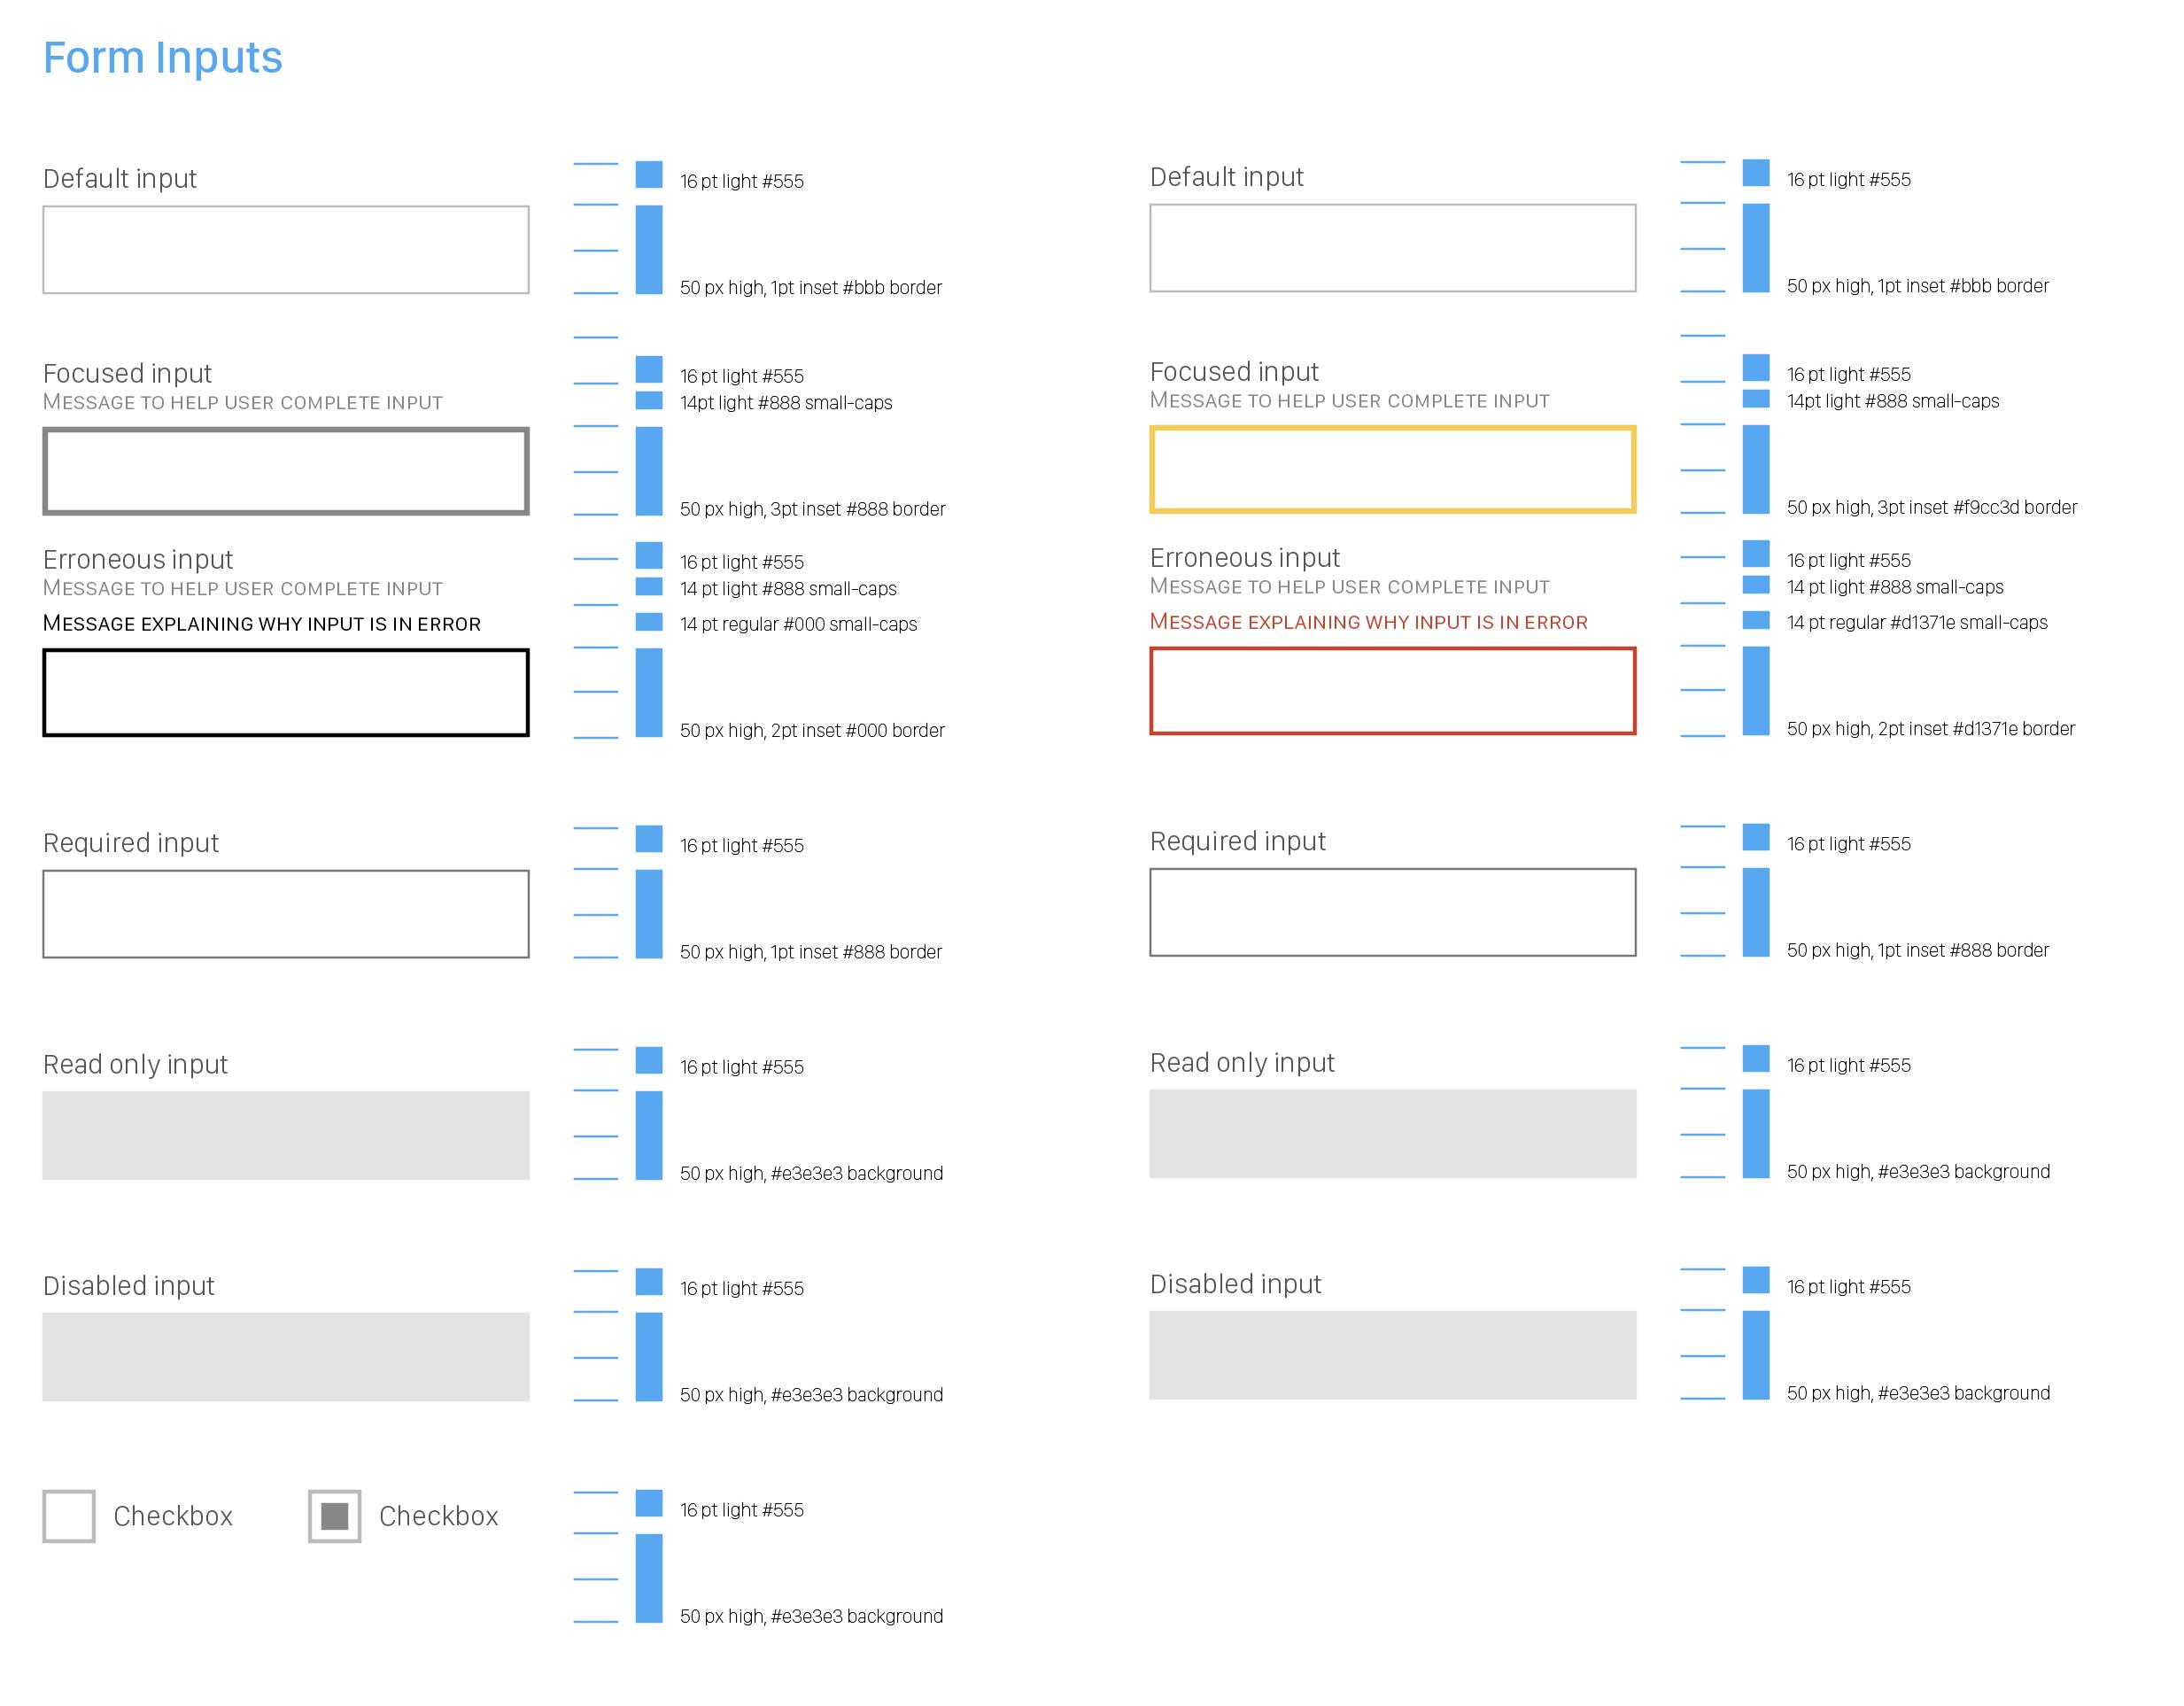 Form inputs